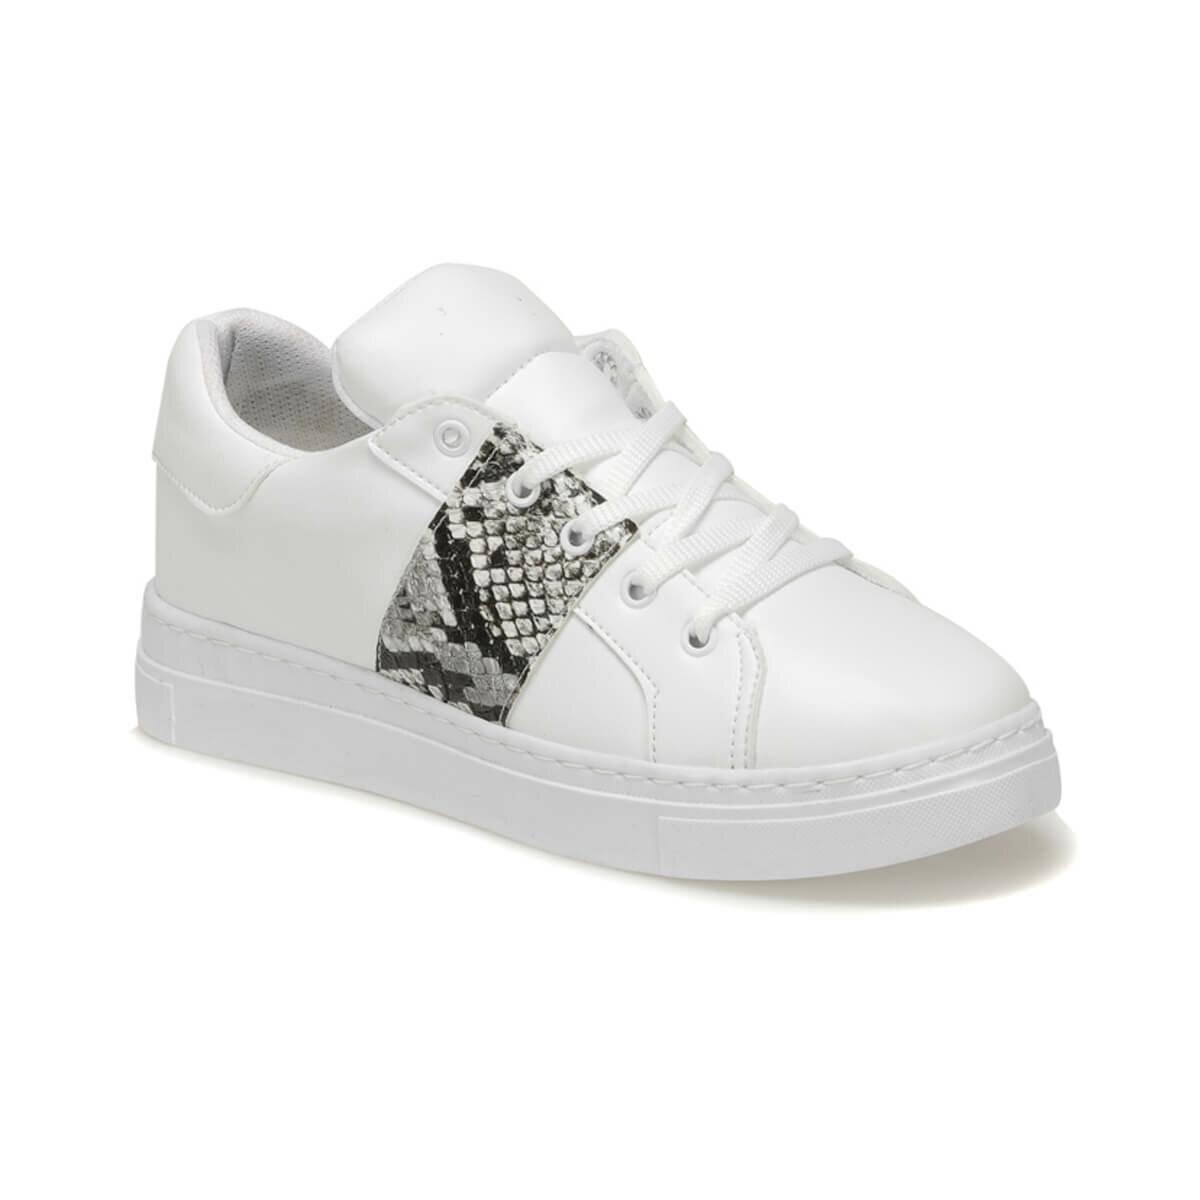 FLO ADELIA91Z SKIN Snake Color Women 'S Sneaker Shoes BUTIGO